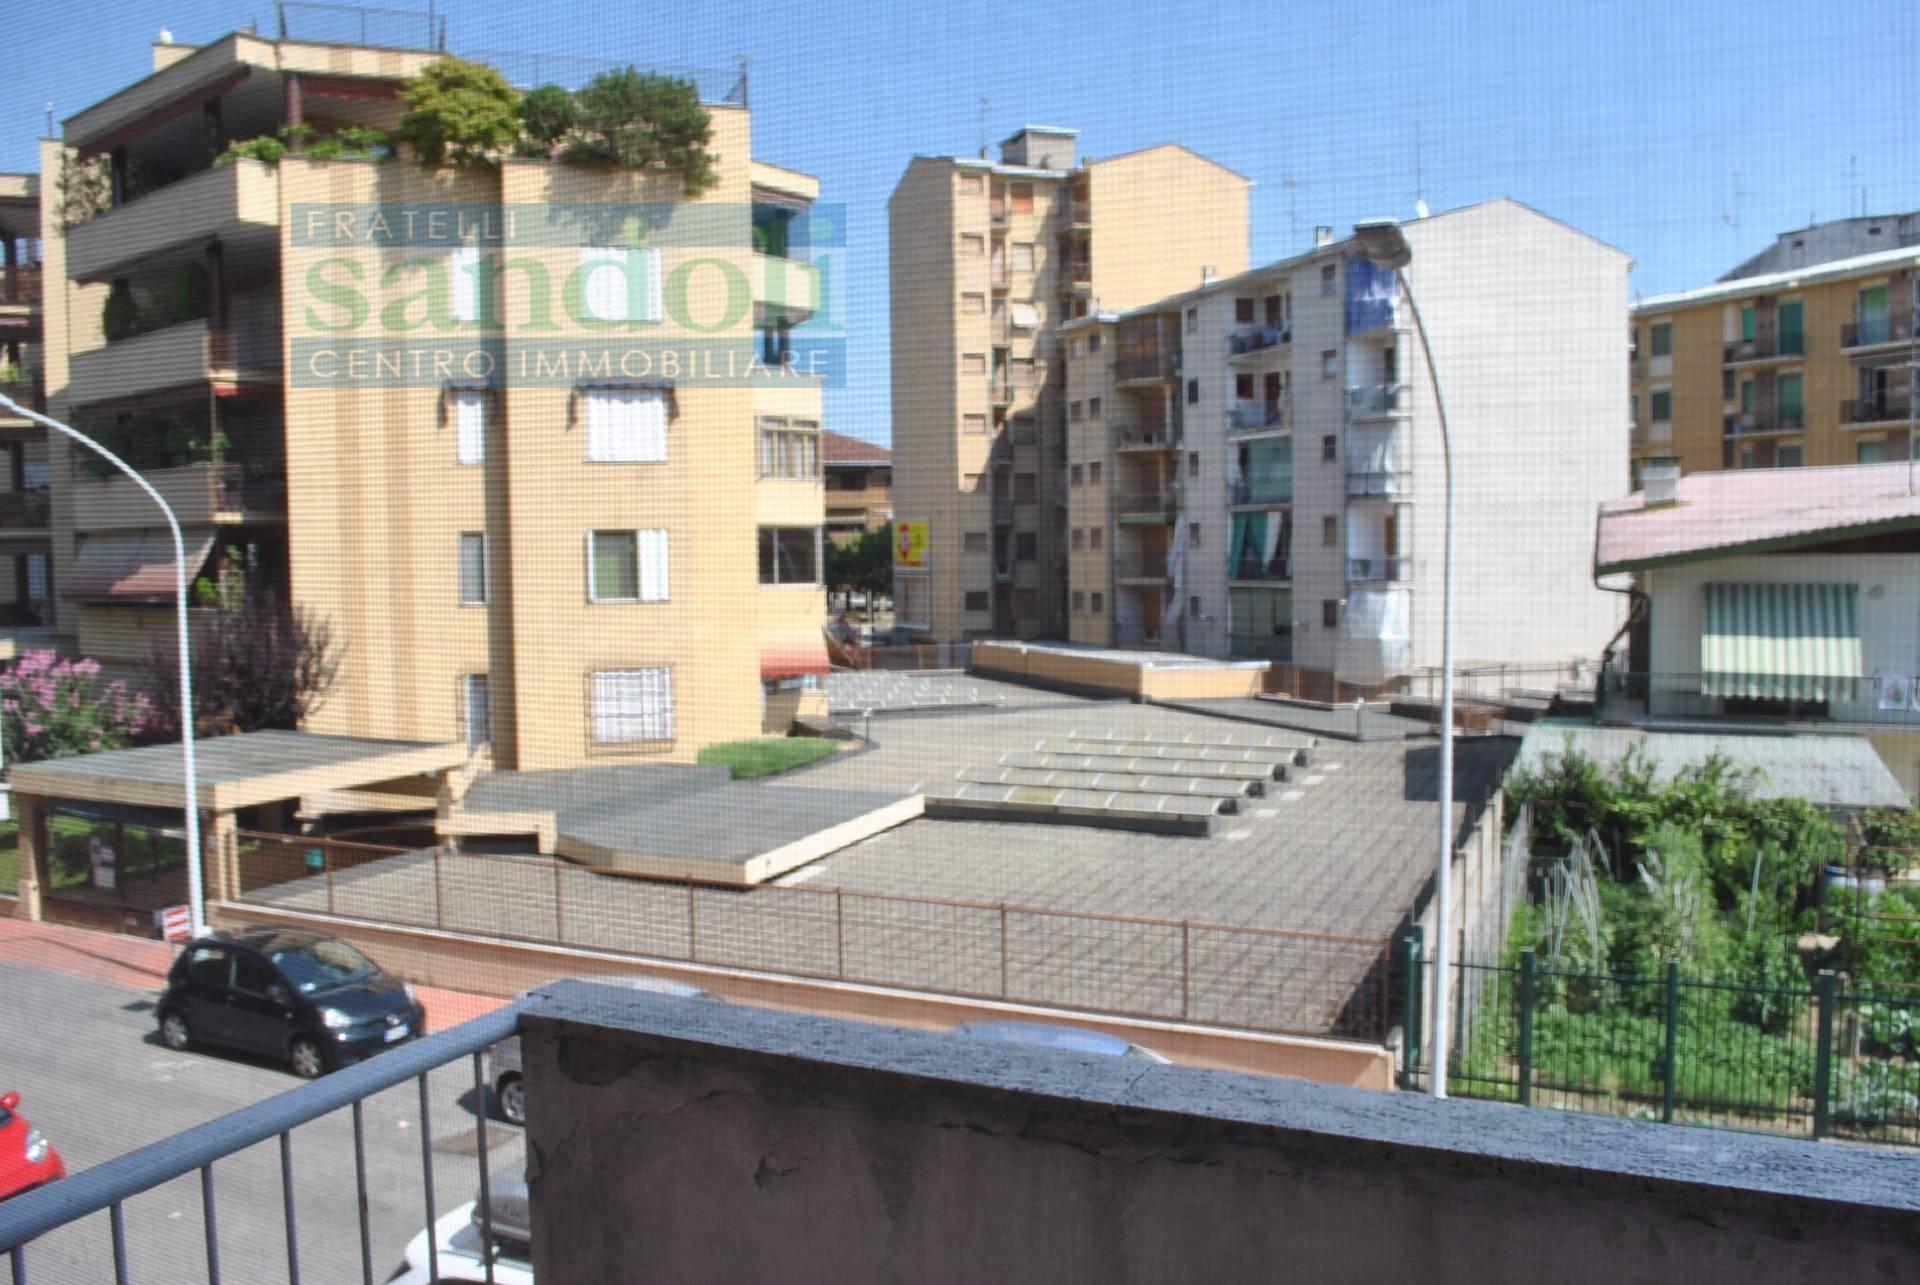 Bilocale Vercelli Via Carpini 9